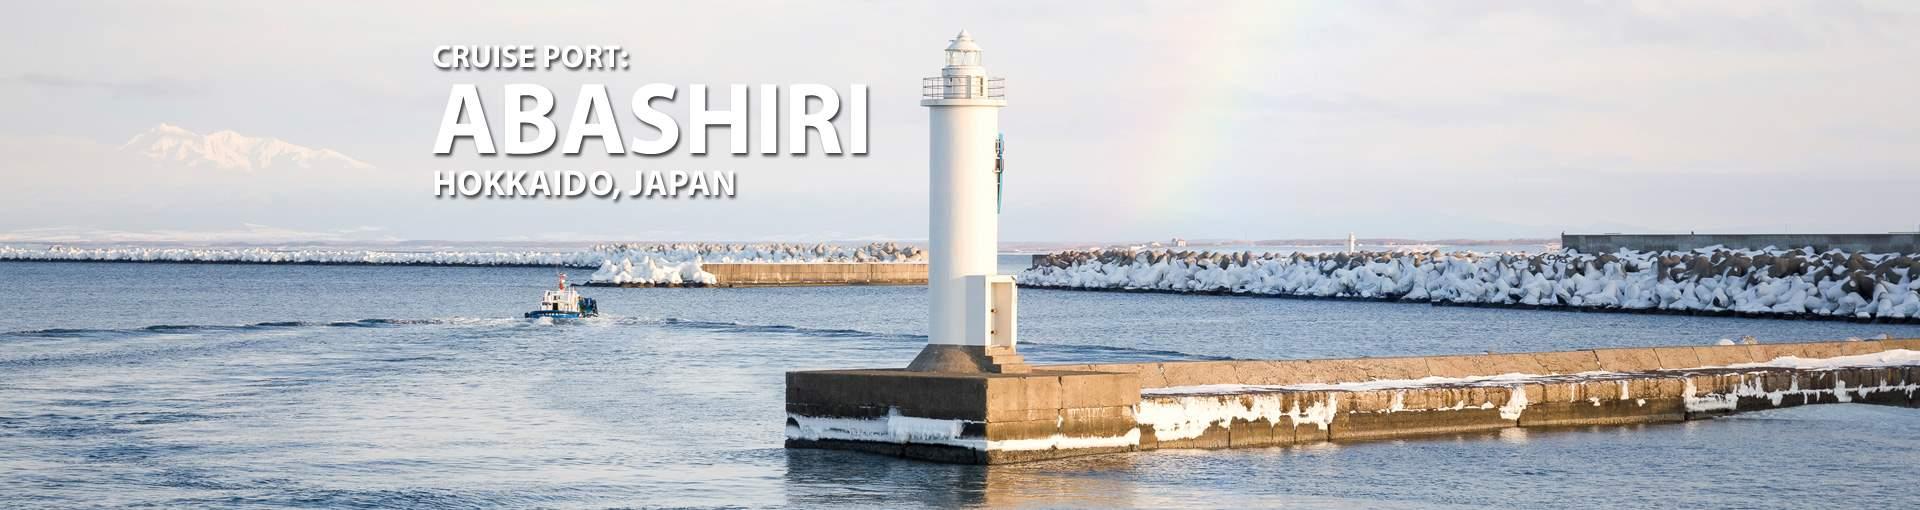 Cruises to Abashiri, Hokkaido, Japan